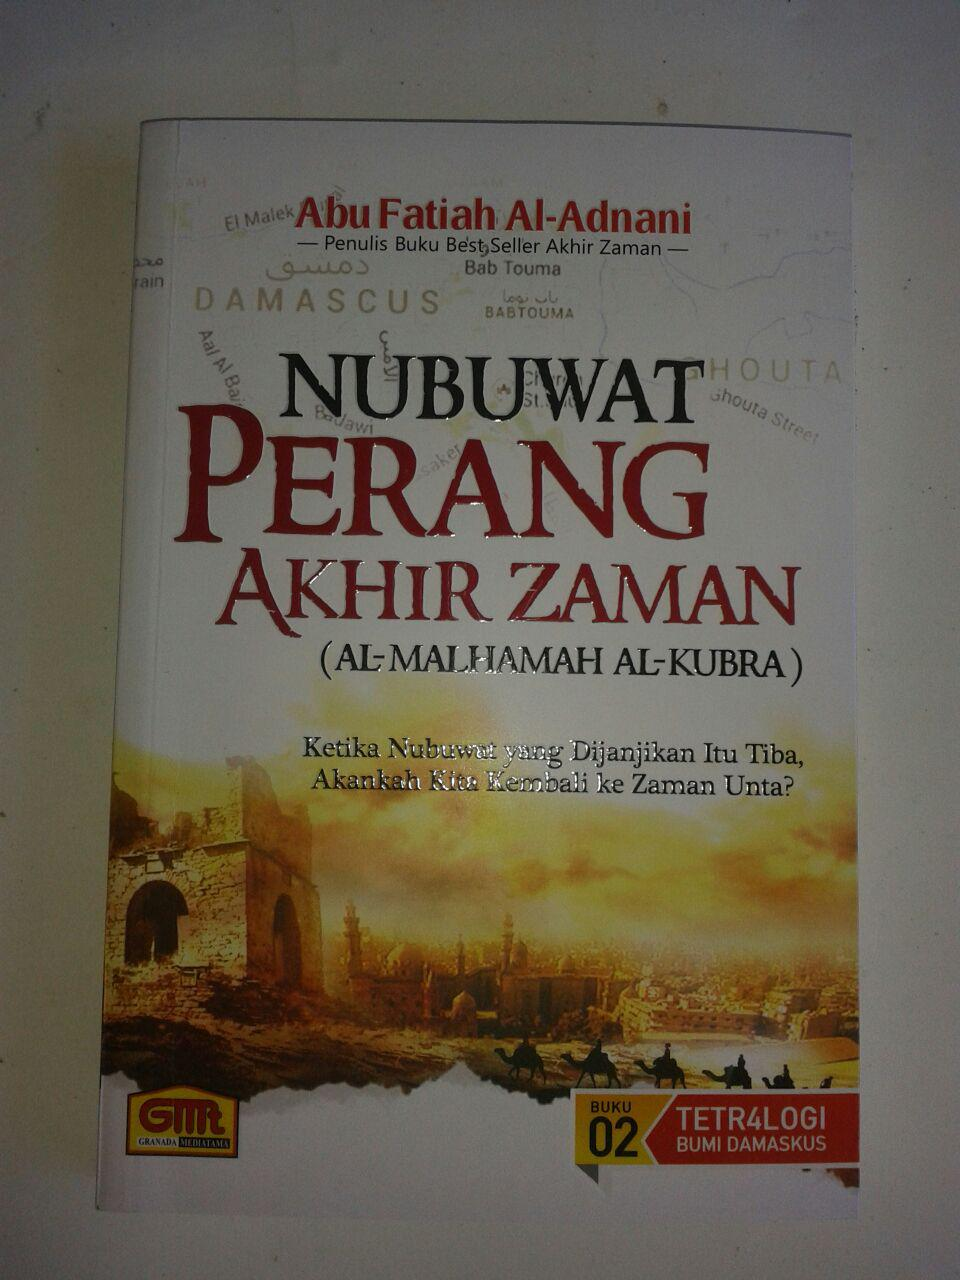 Buku Nubuwat Perang Akhir Zaman cover 2